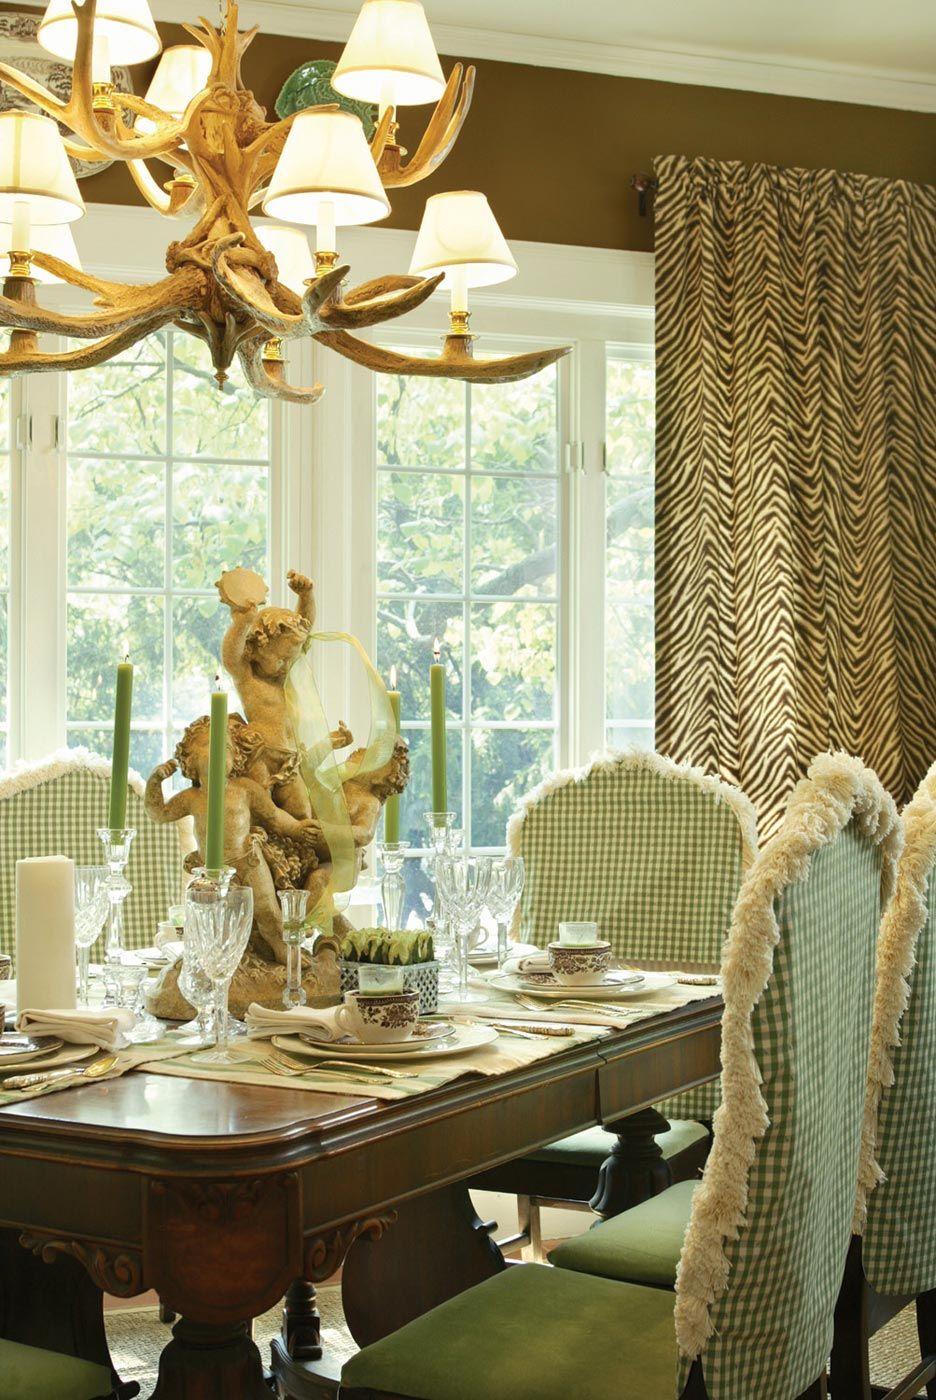 Brown Walls Brown Zebra Curtains Faux Antler Chandelierlove Adorable Zebra Dining Room Chairs Decorating Design